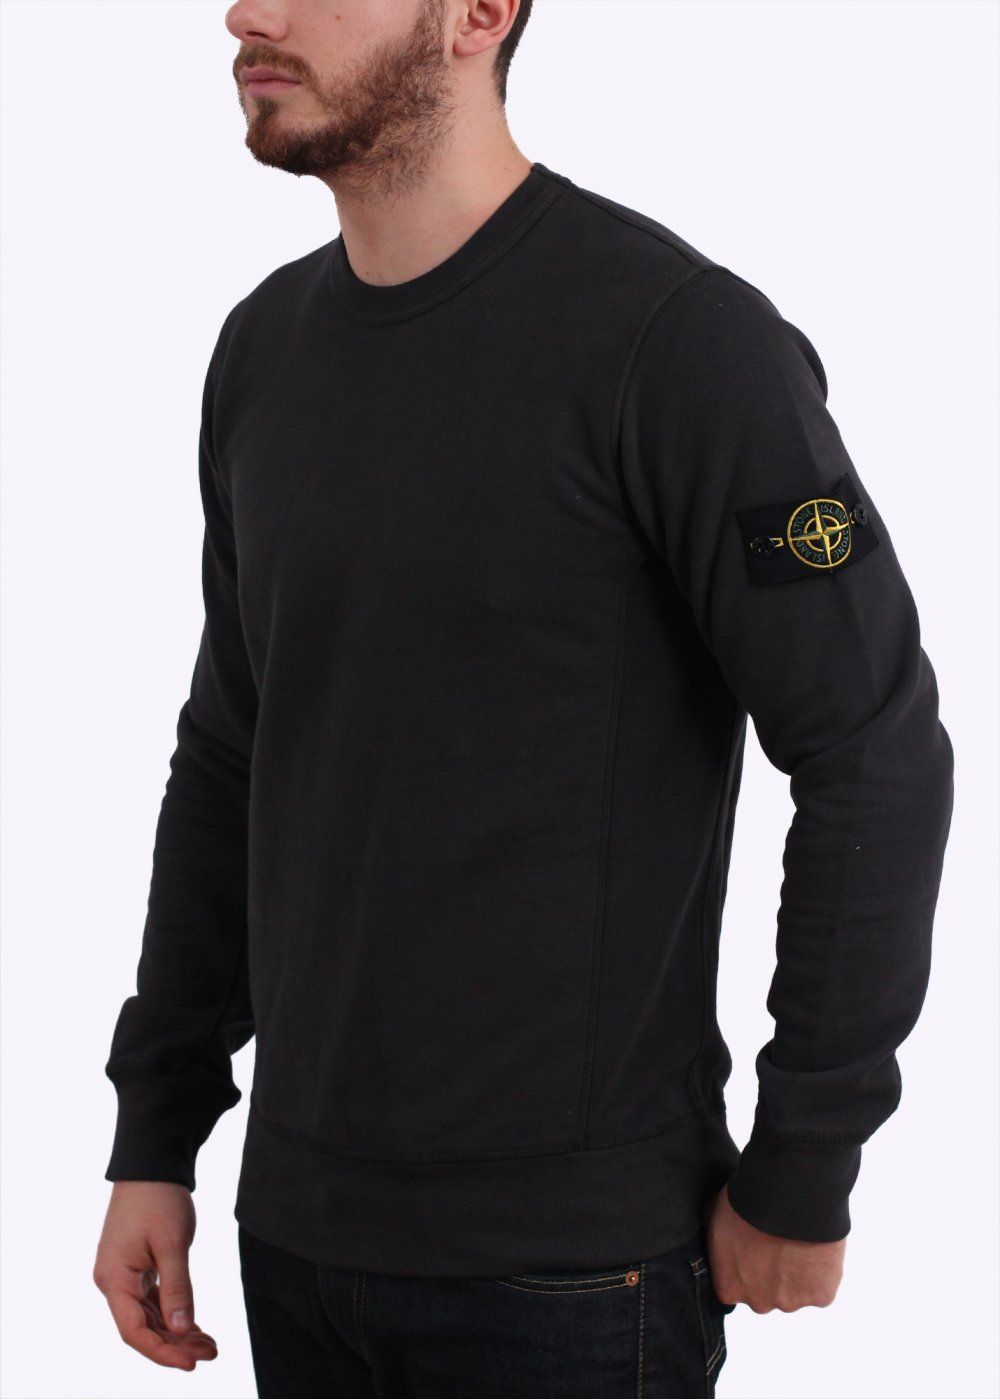 Crew Sweater Dark Grey Stone Island Clothing Stone Island Sweatshirt Stone Island Jacket